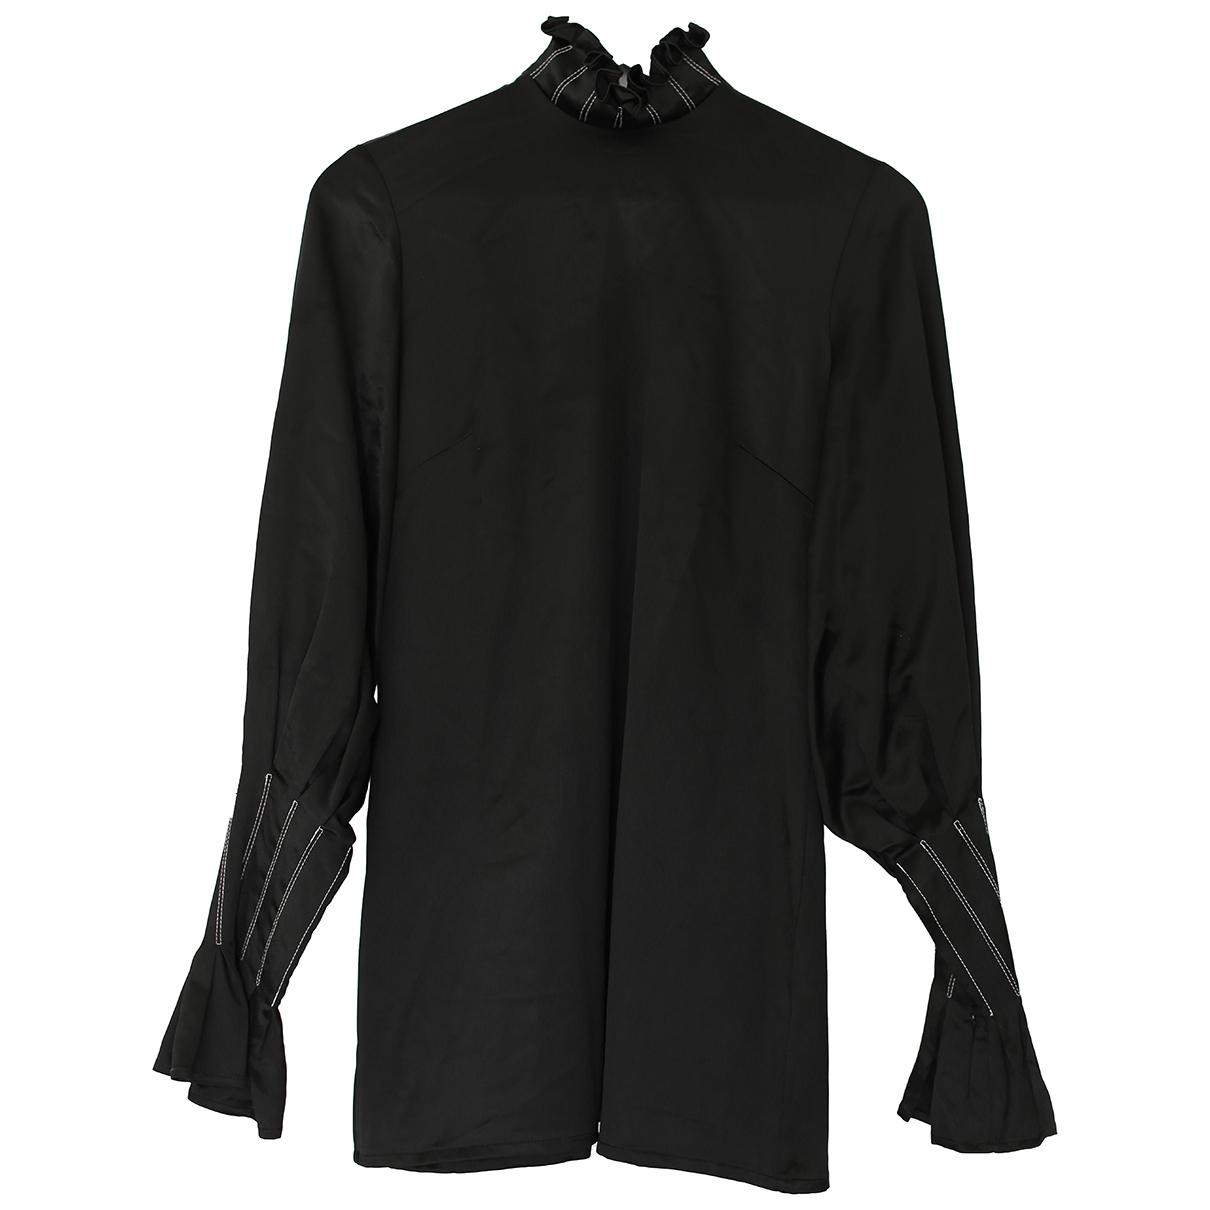 Beaufille \N Black  top for Women 4 US